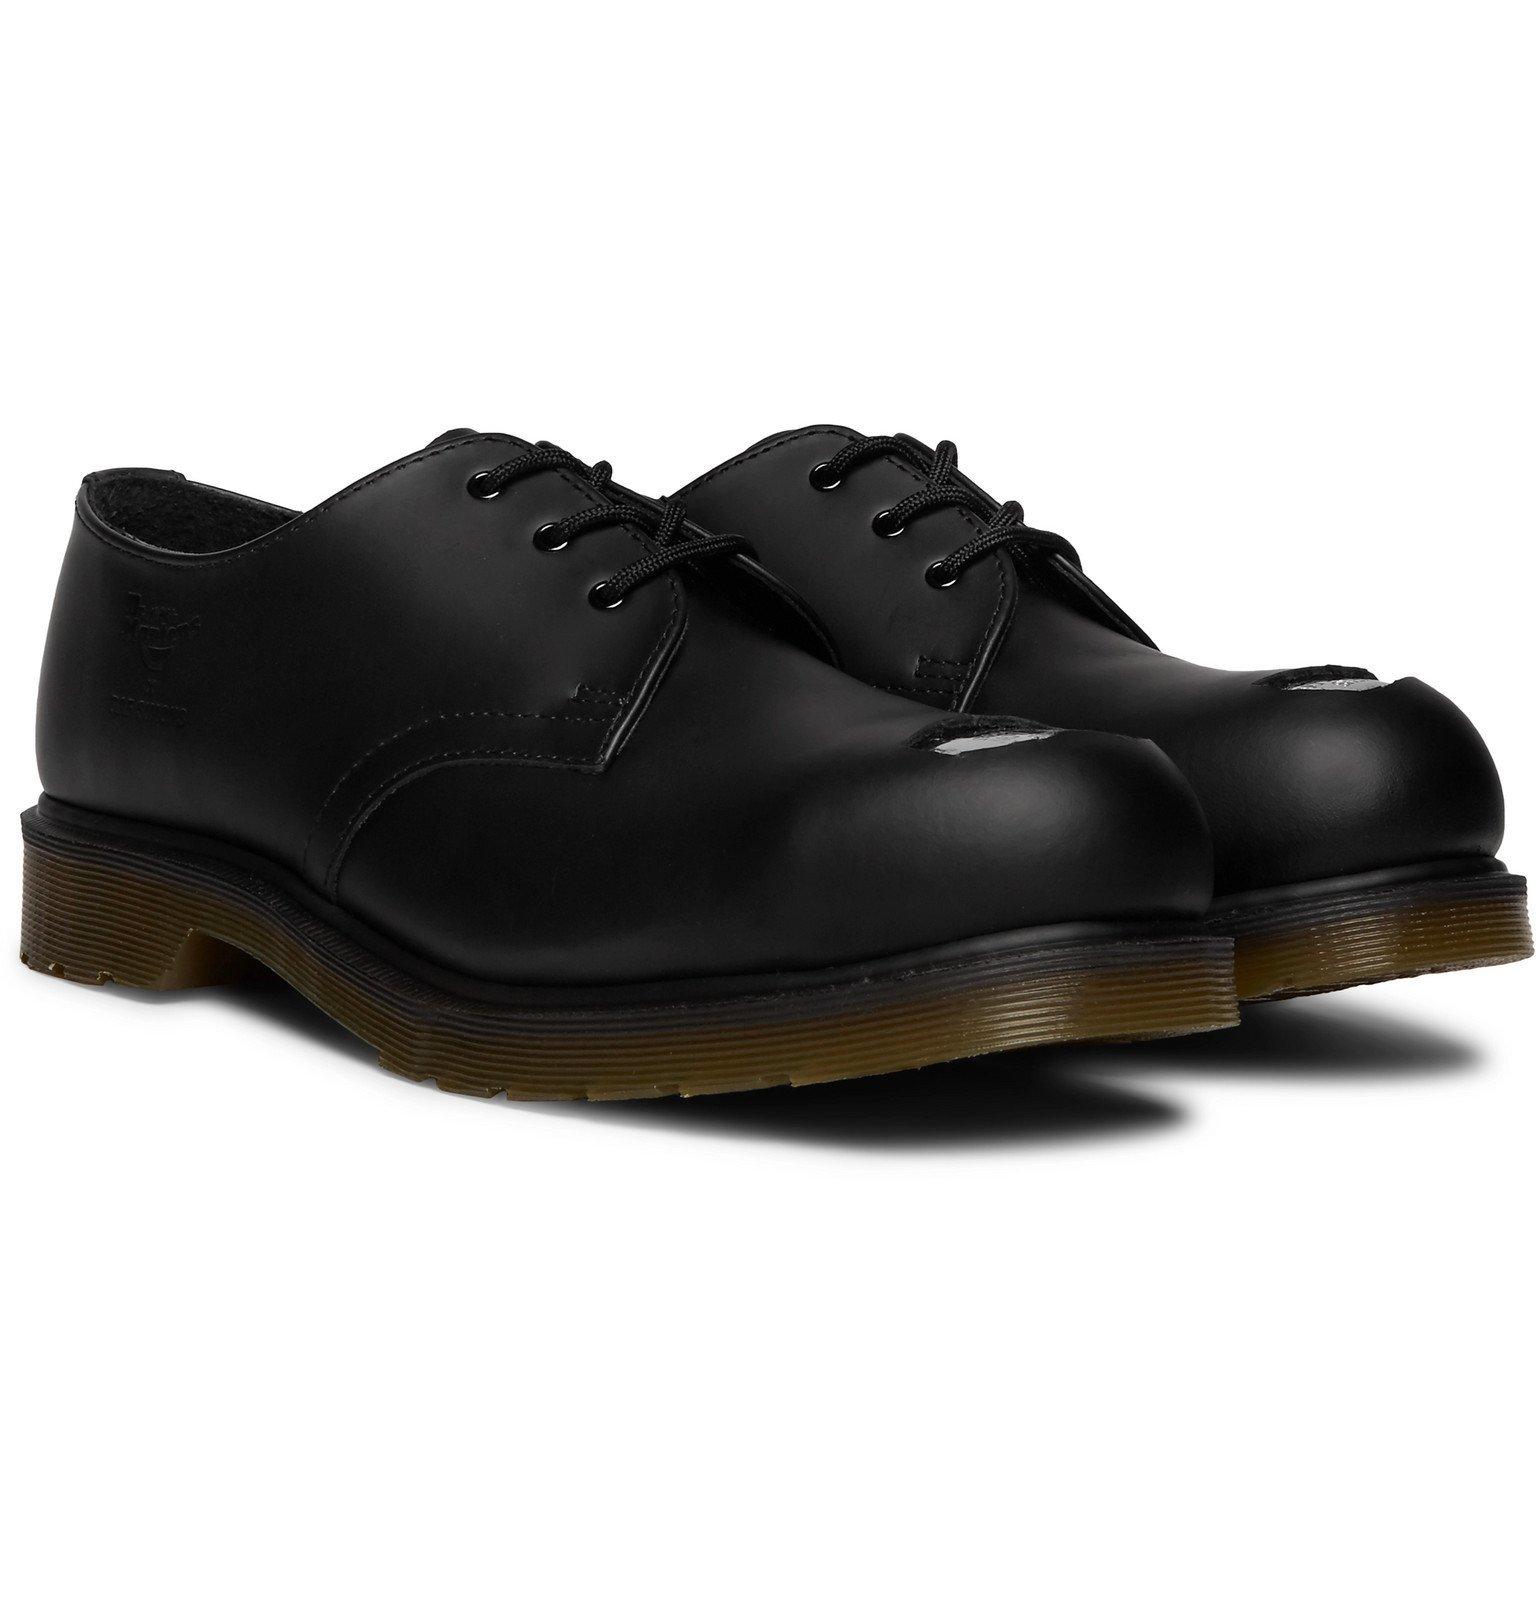 Raf Simons - Dr. Martens Leather Derby Shoes - Black